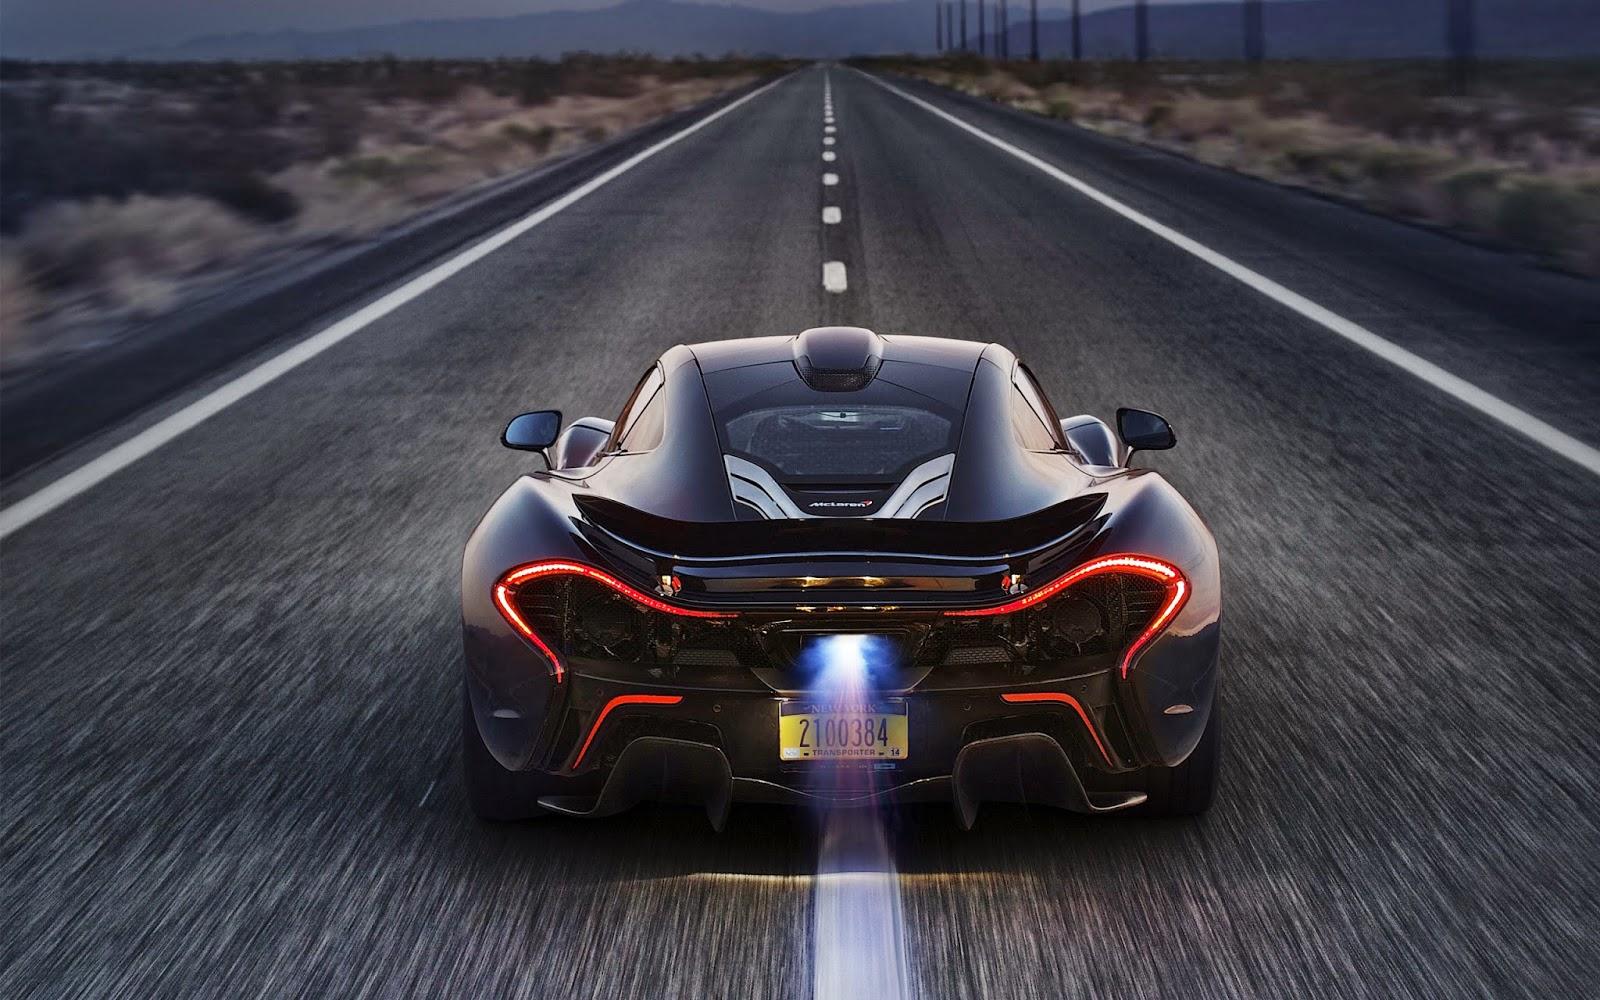 car wallpapers 2014, iphone car, fast cool cars, sports cars, bumblebee cars, bugatti cars, desktop s, honda cars s, 3d black cars s (6)